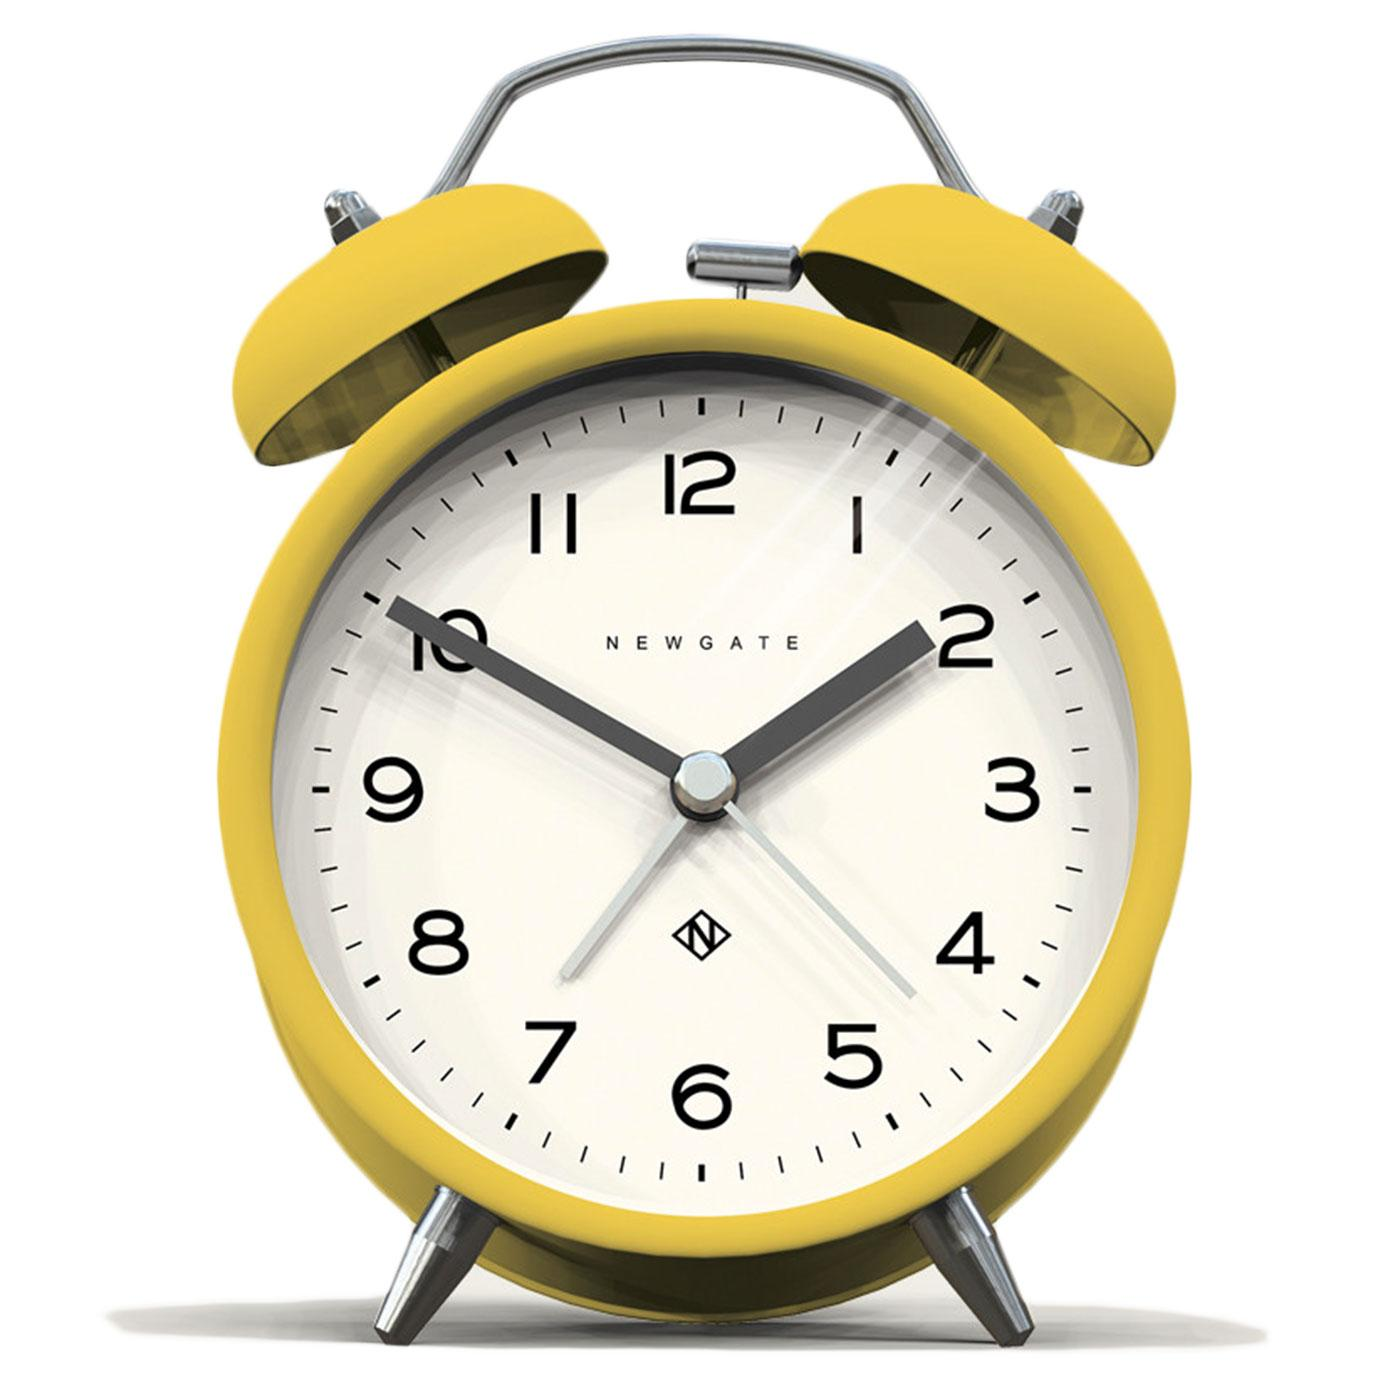 Echo NEWGATE CLOCKS Retro Bell Alarm Clock Yellow